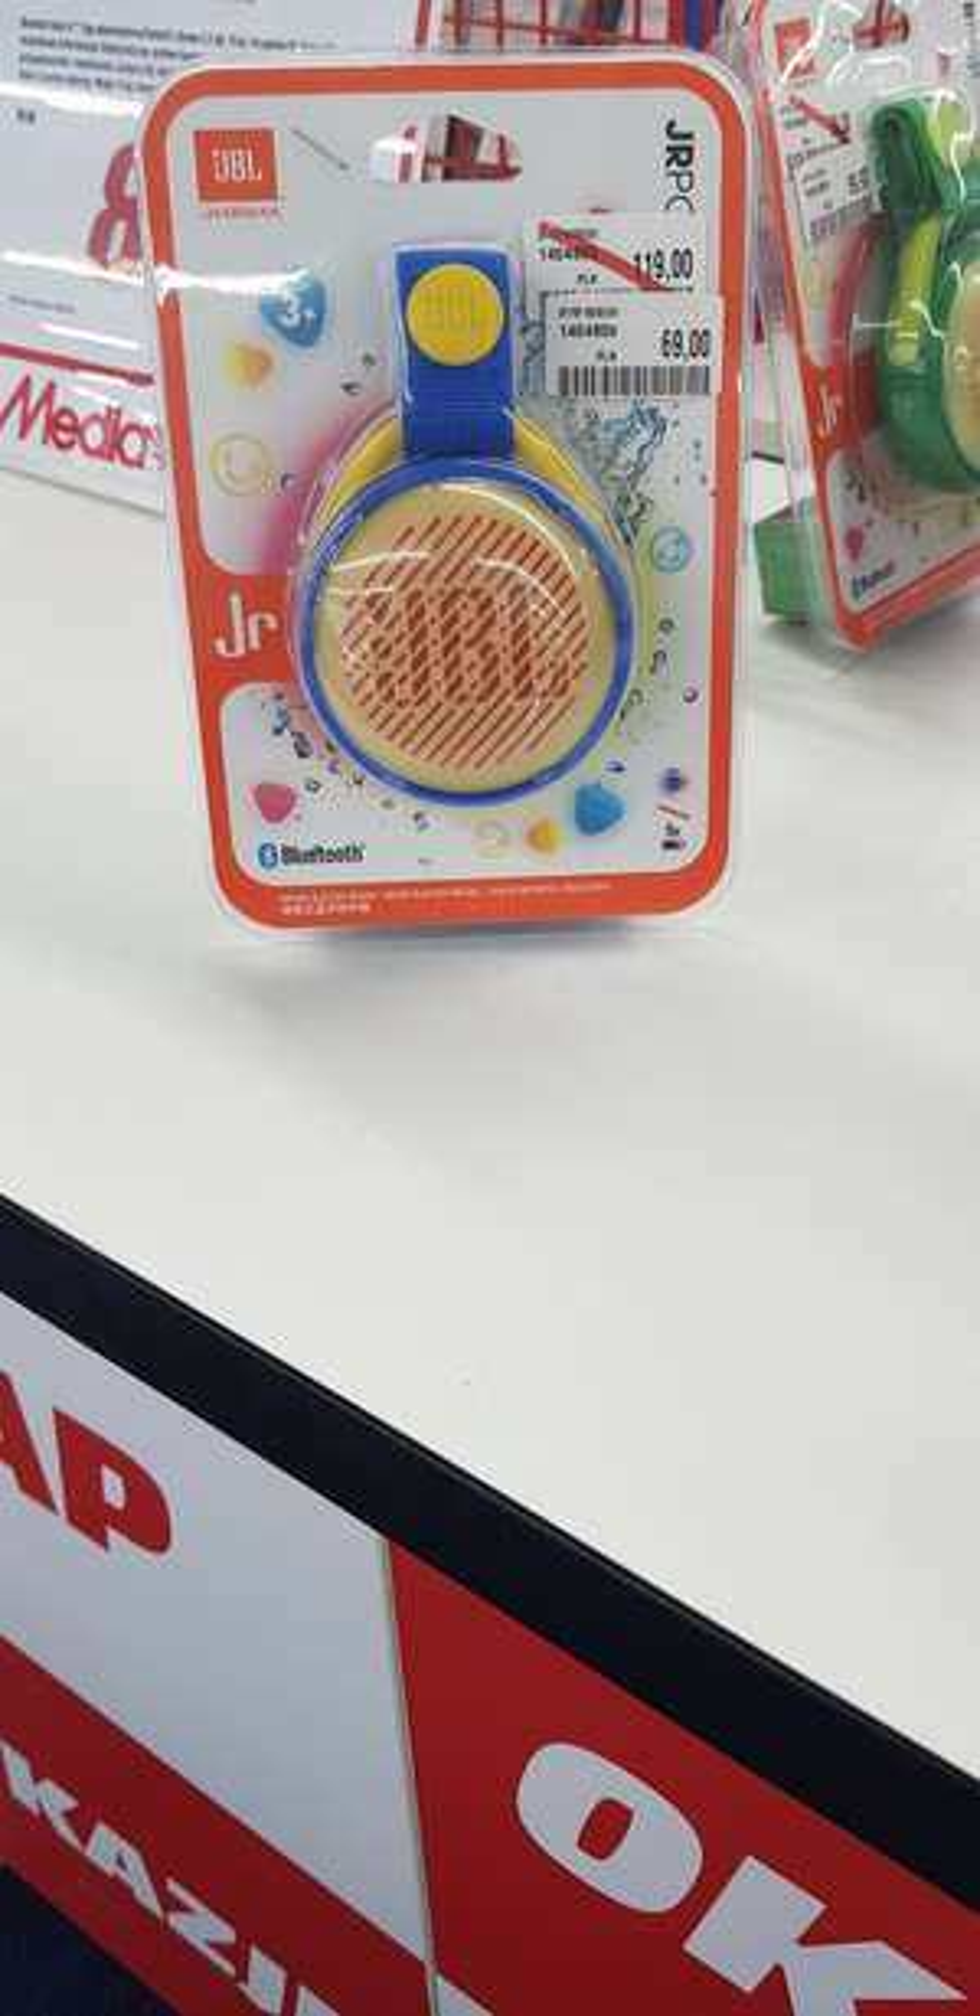 Głośnik JBL JRPOP Media Markt